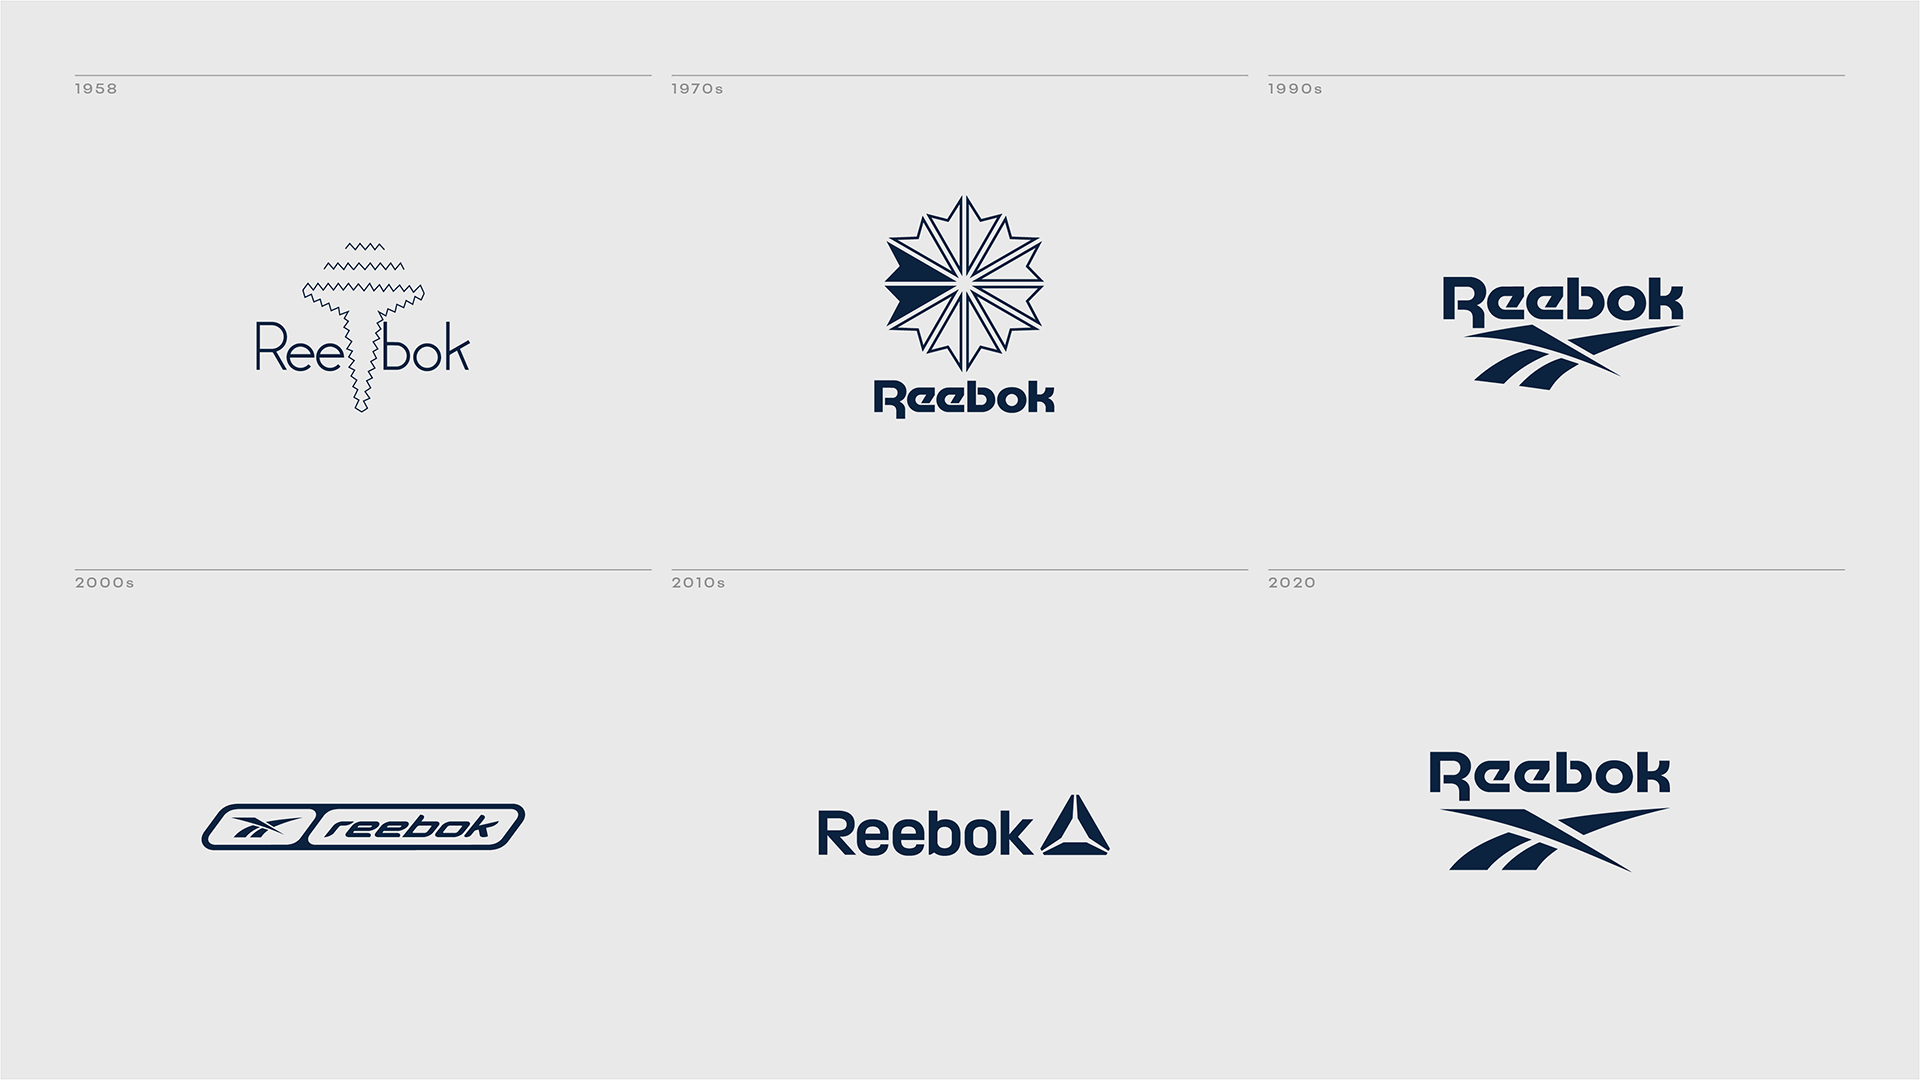 reebok_2019_logo_evolution